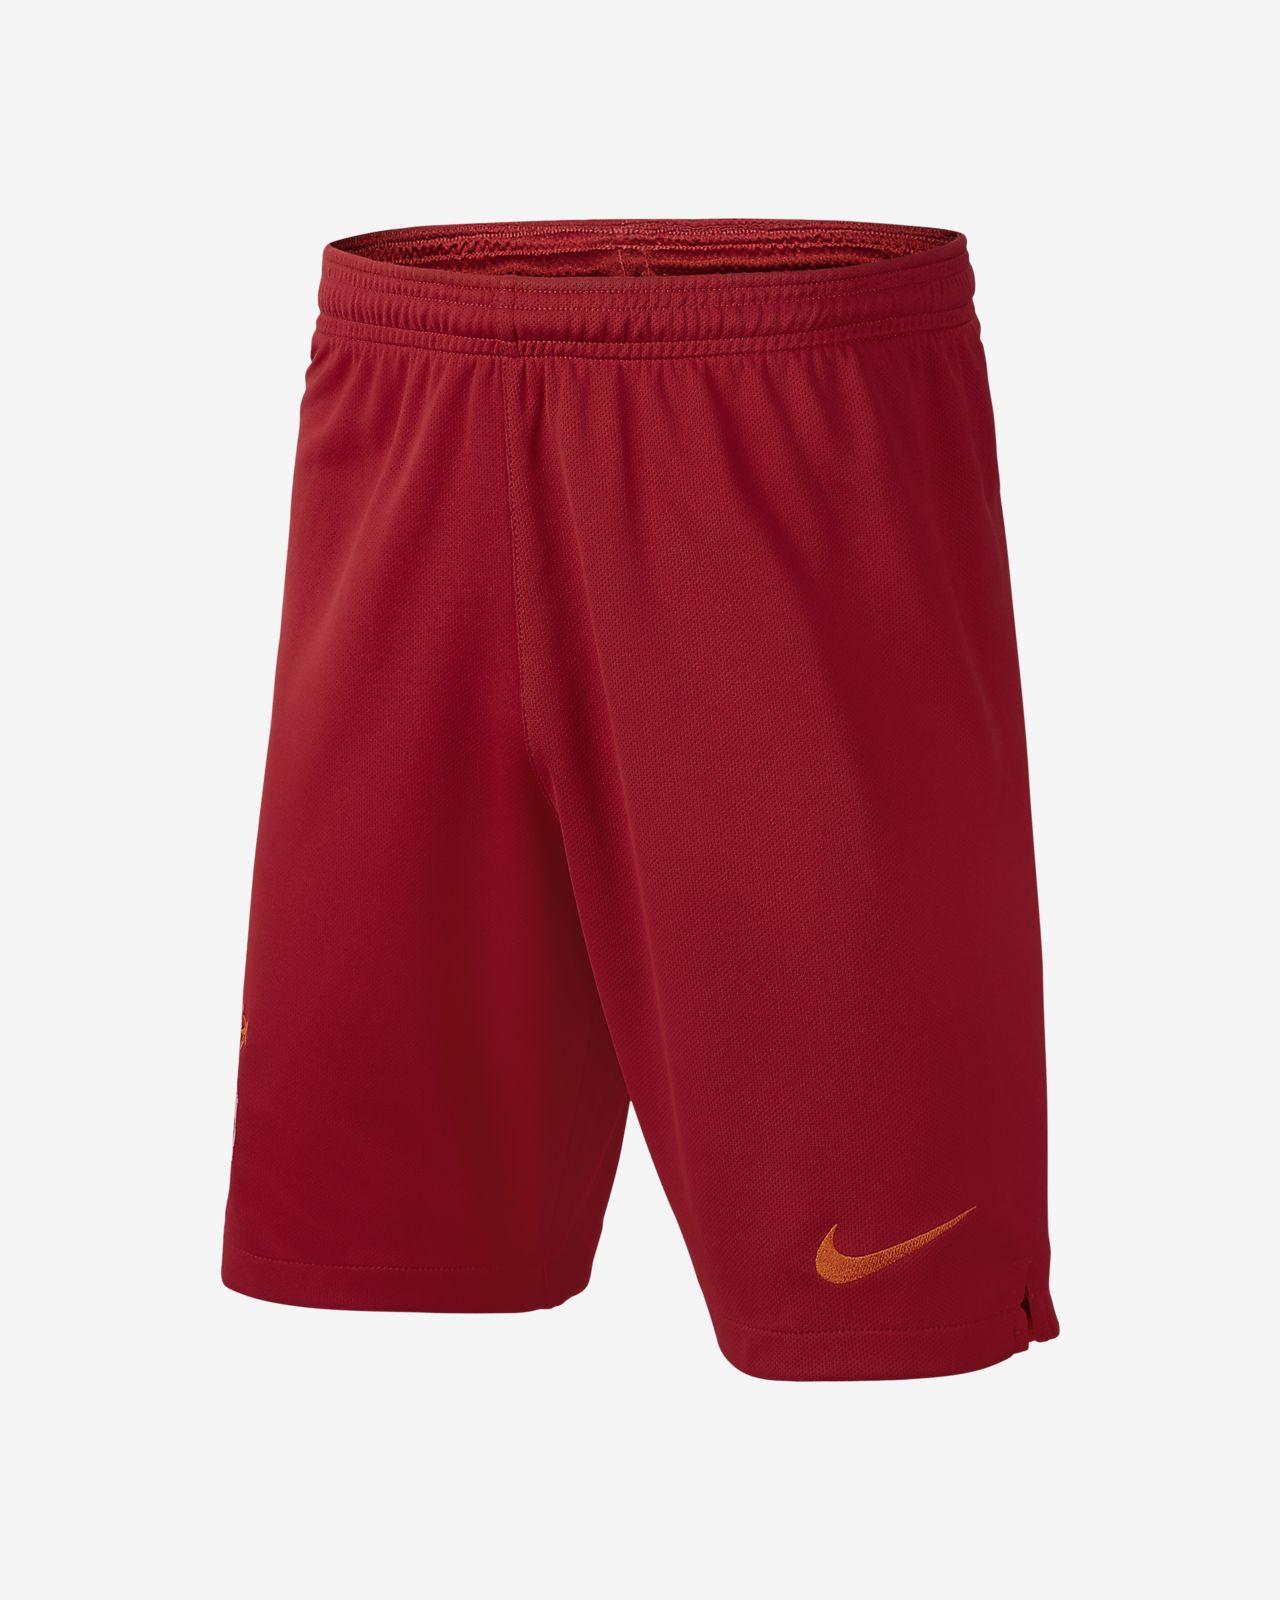 Shorts da calcio Galatasaray 2019/20 Stadium Home/Away - Ragazzi